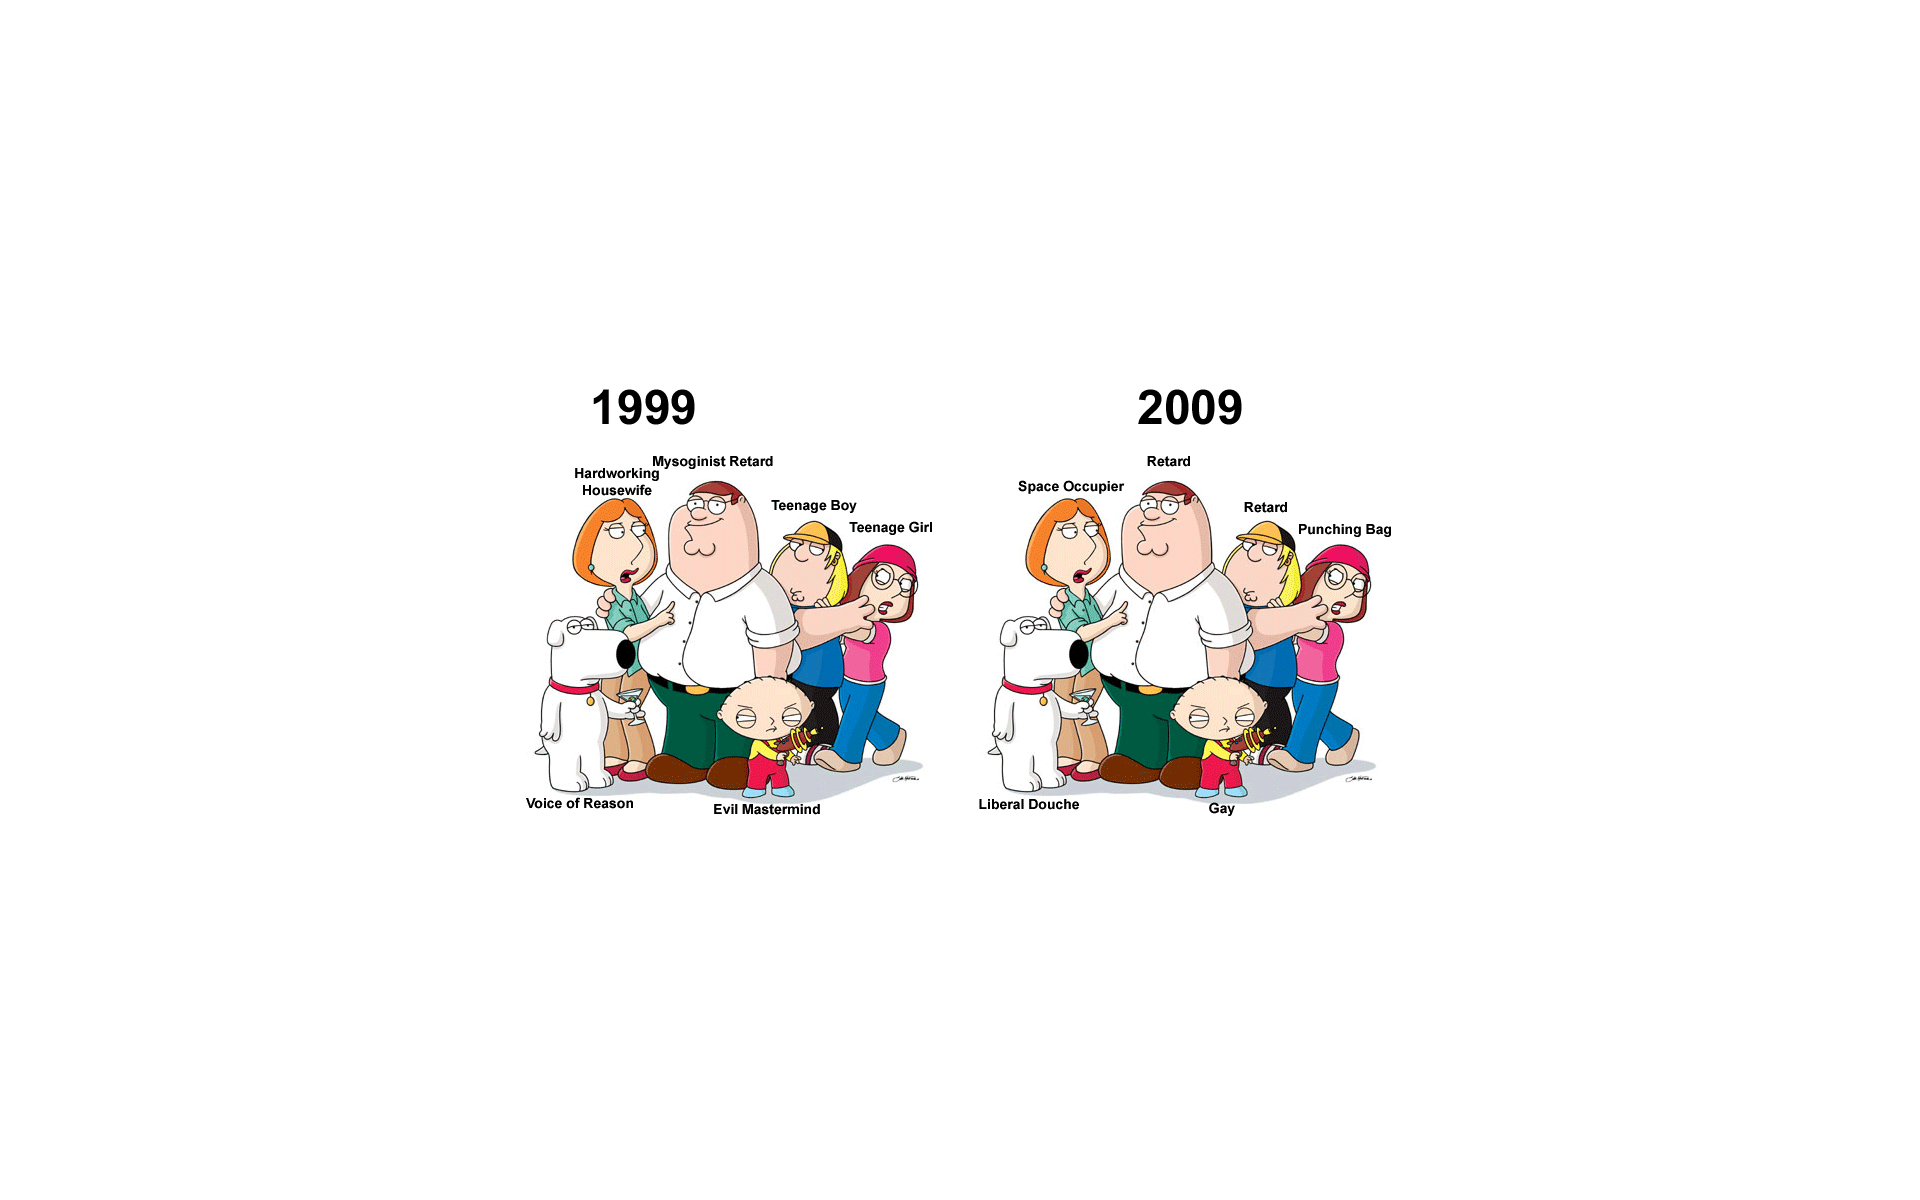 76 Family Guy Wallpaper For Computer On Wallpapersafari